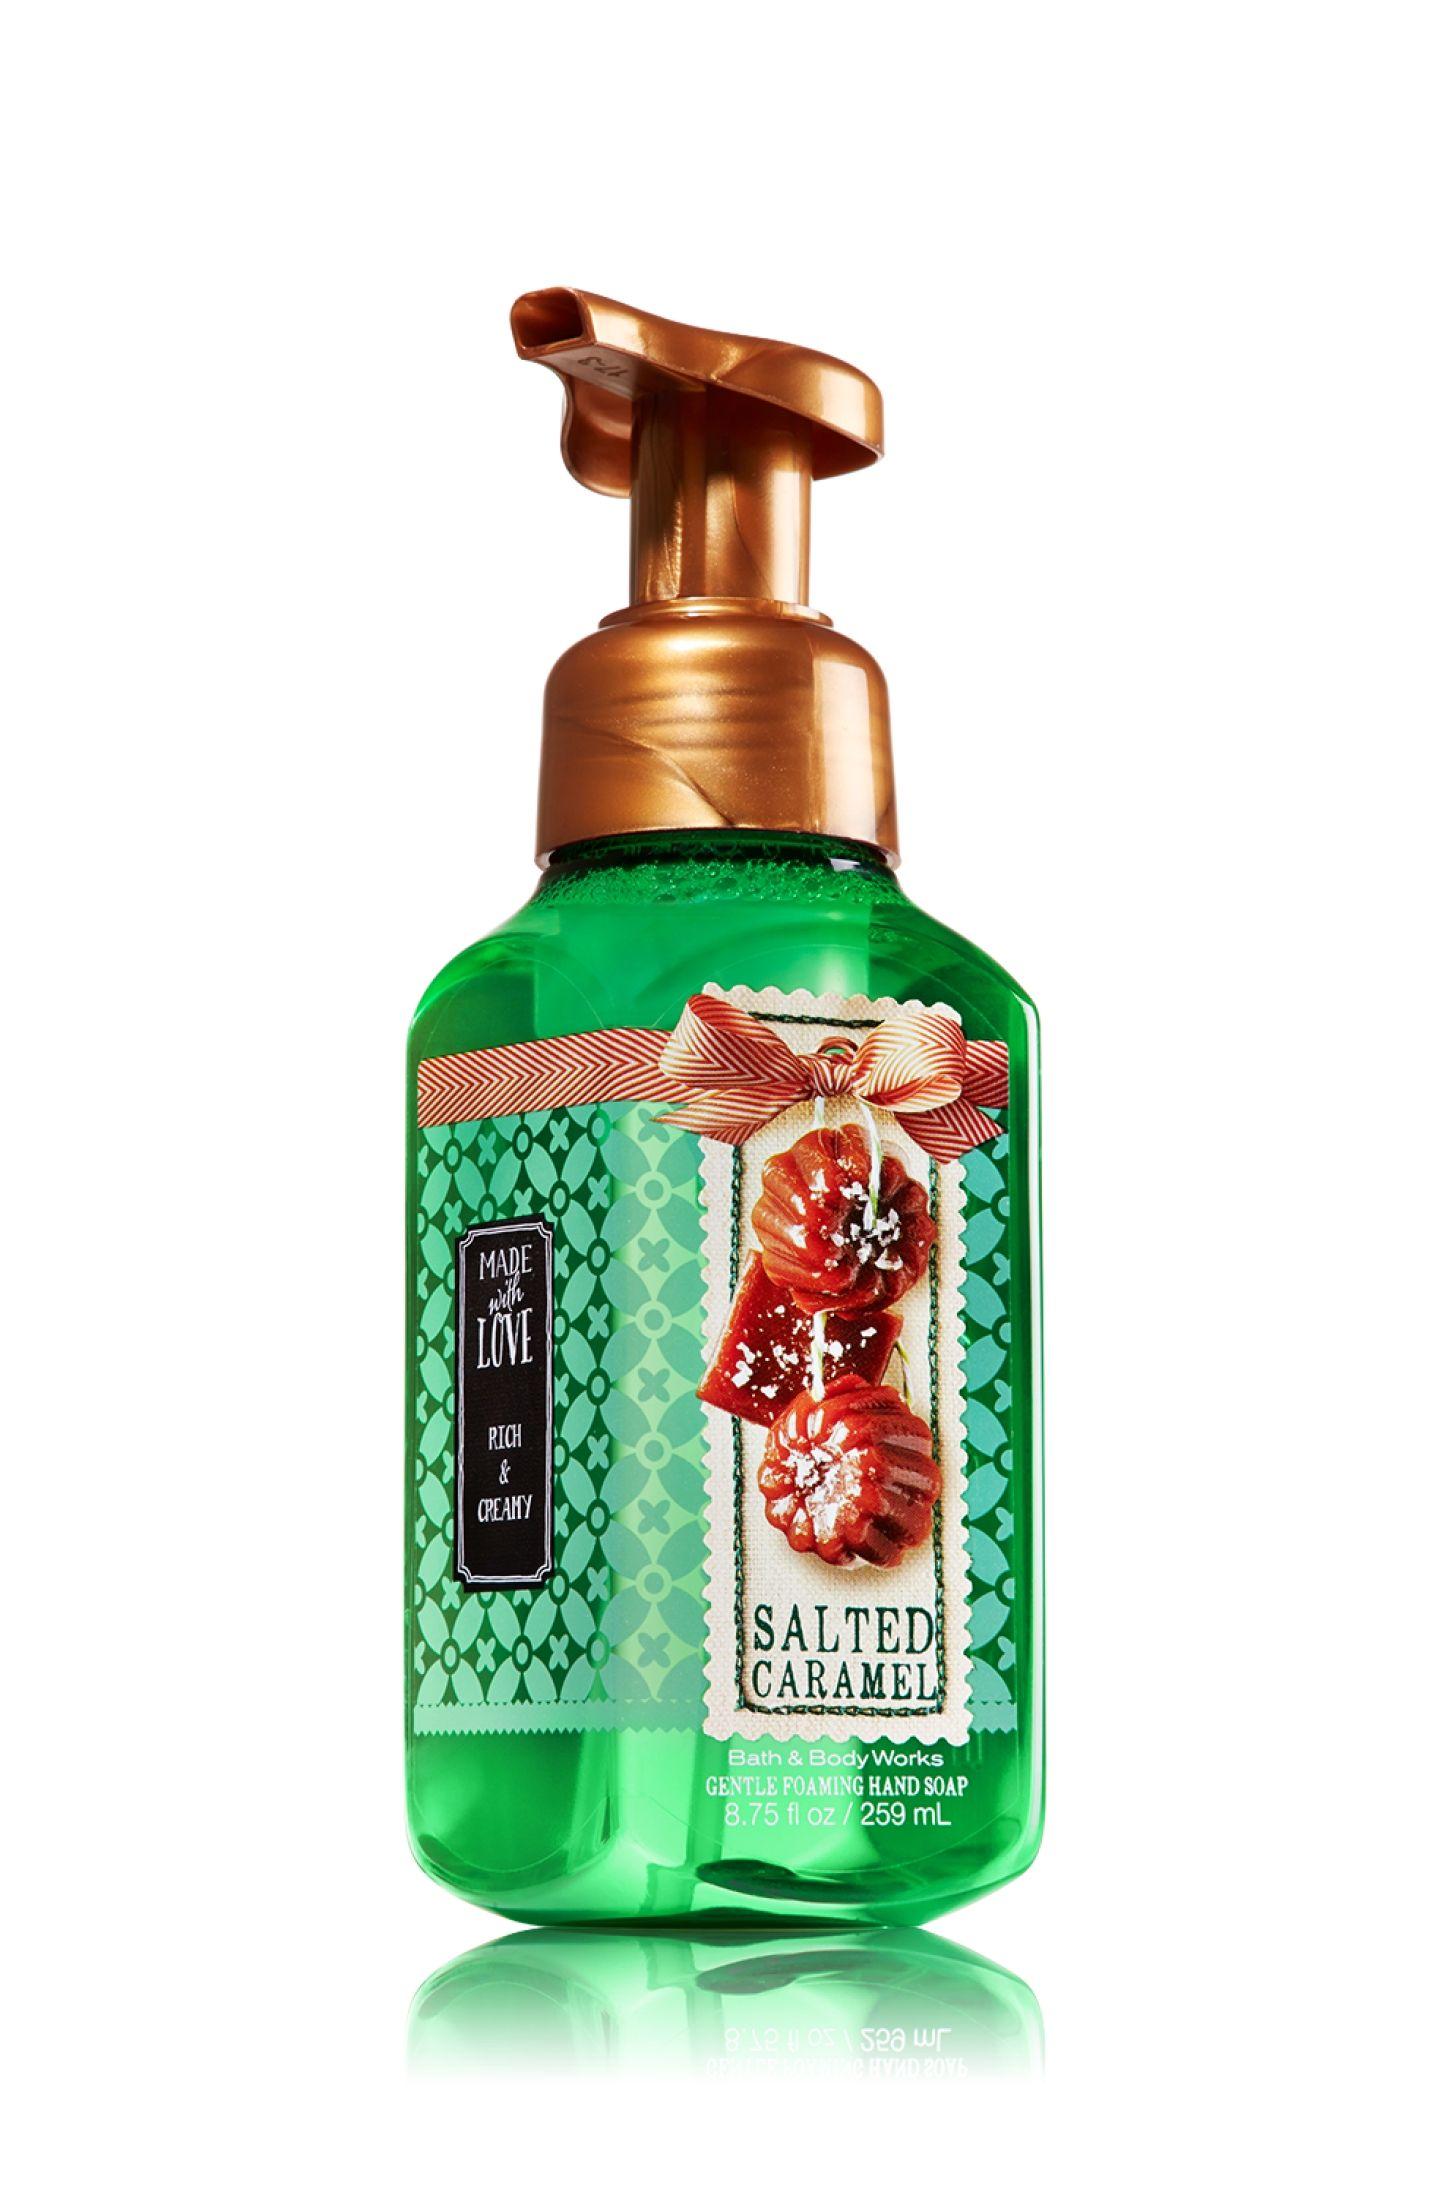 Salted Caramel Gentle Foaming Hand Soap Soap Sanitizer Bath